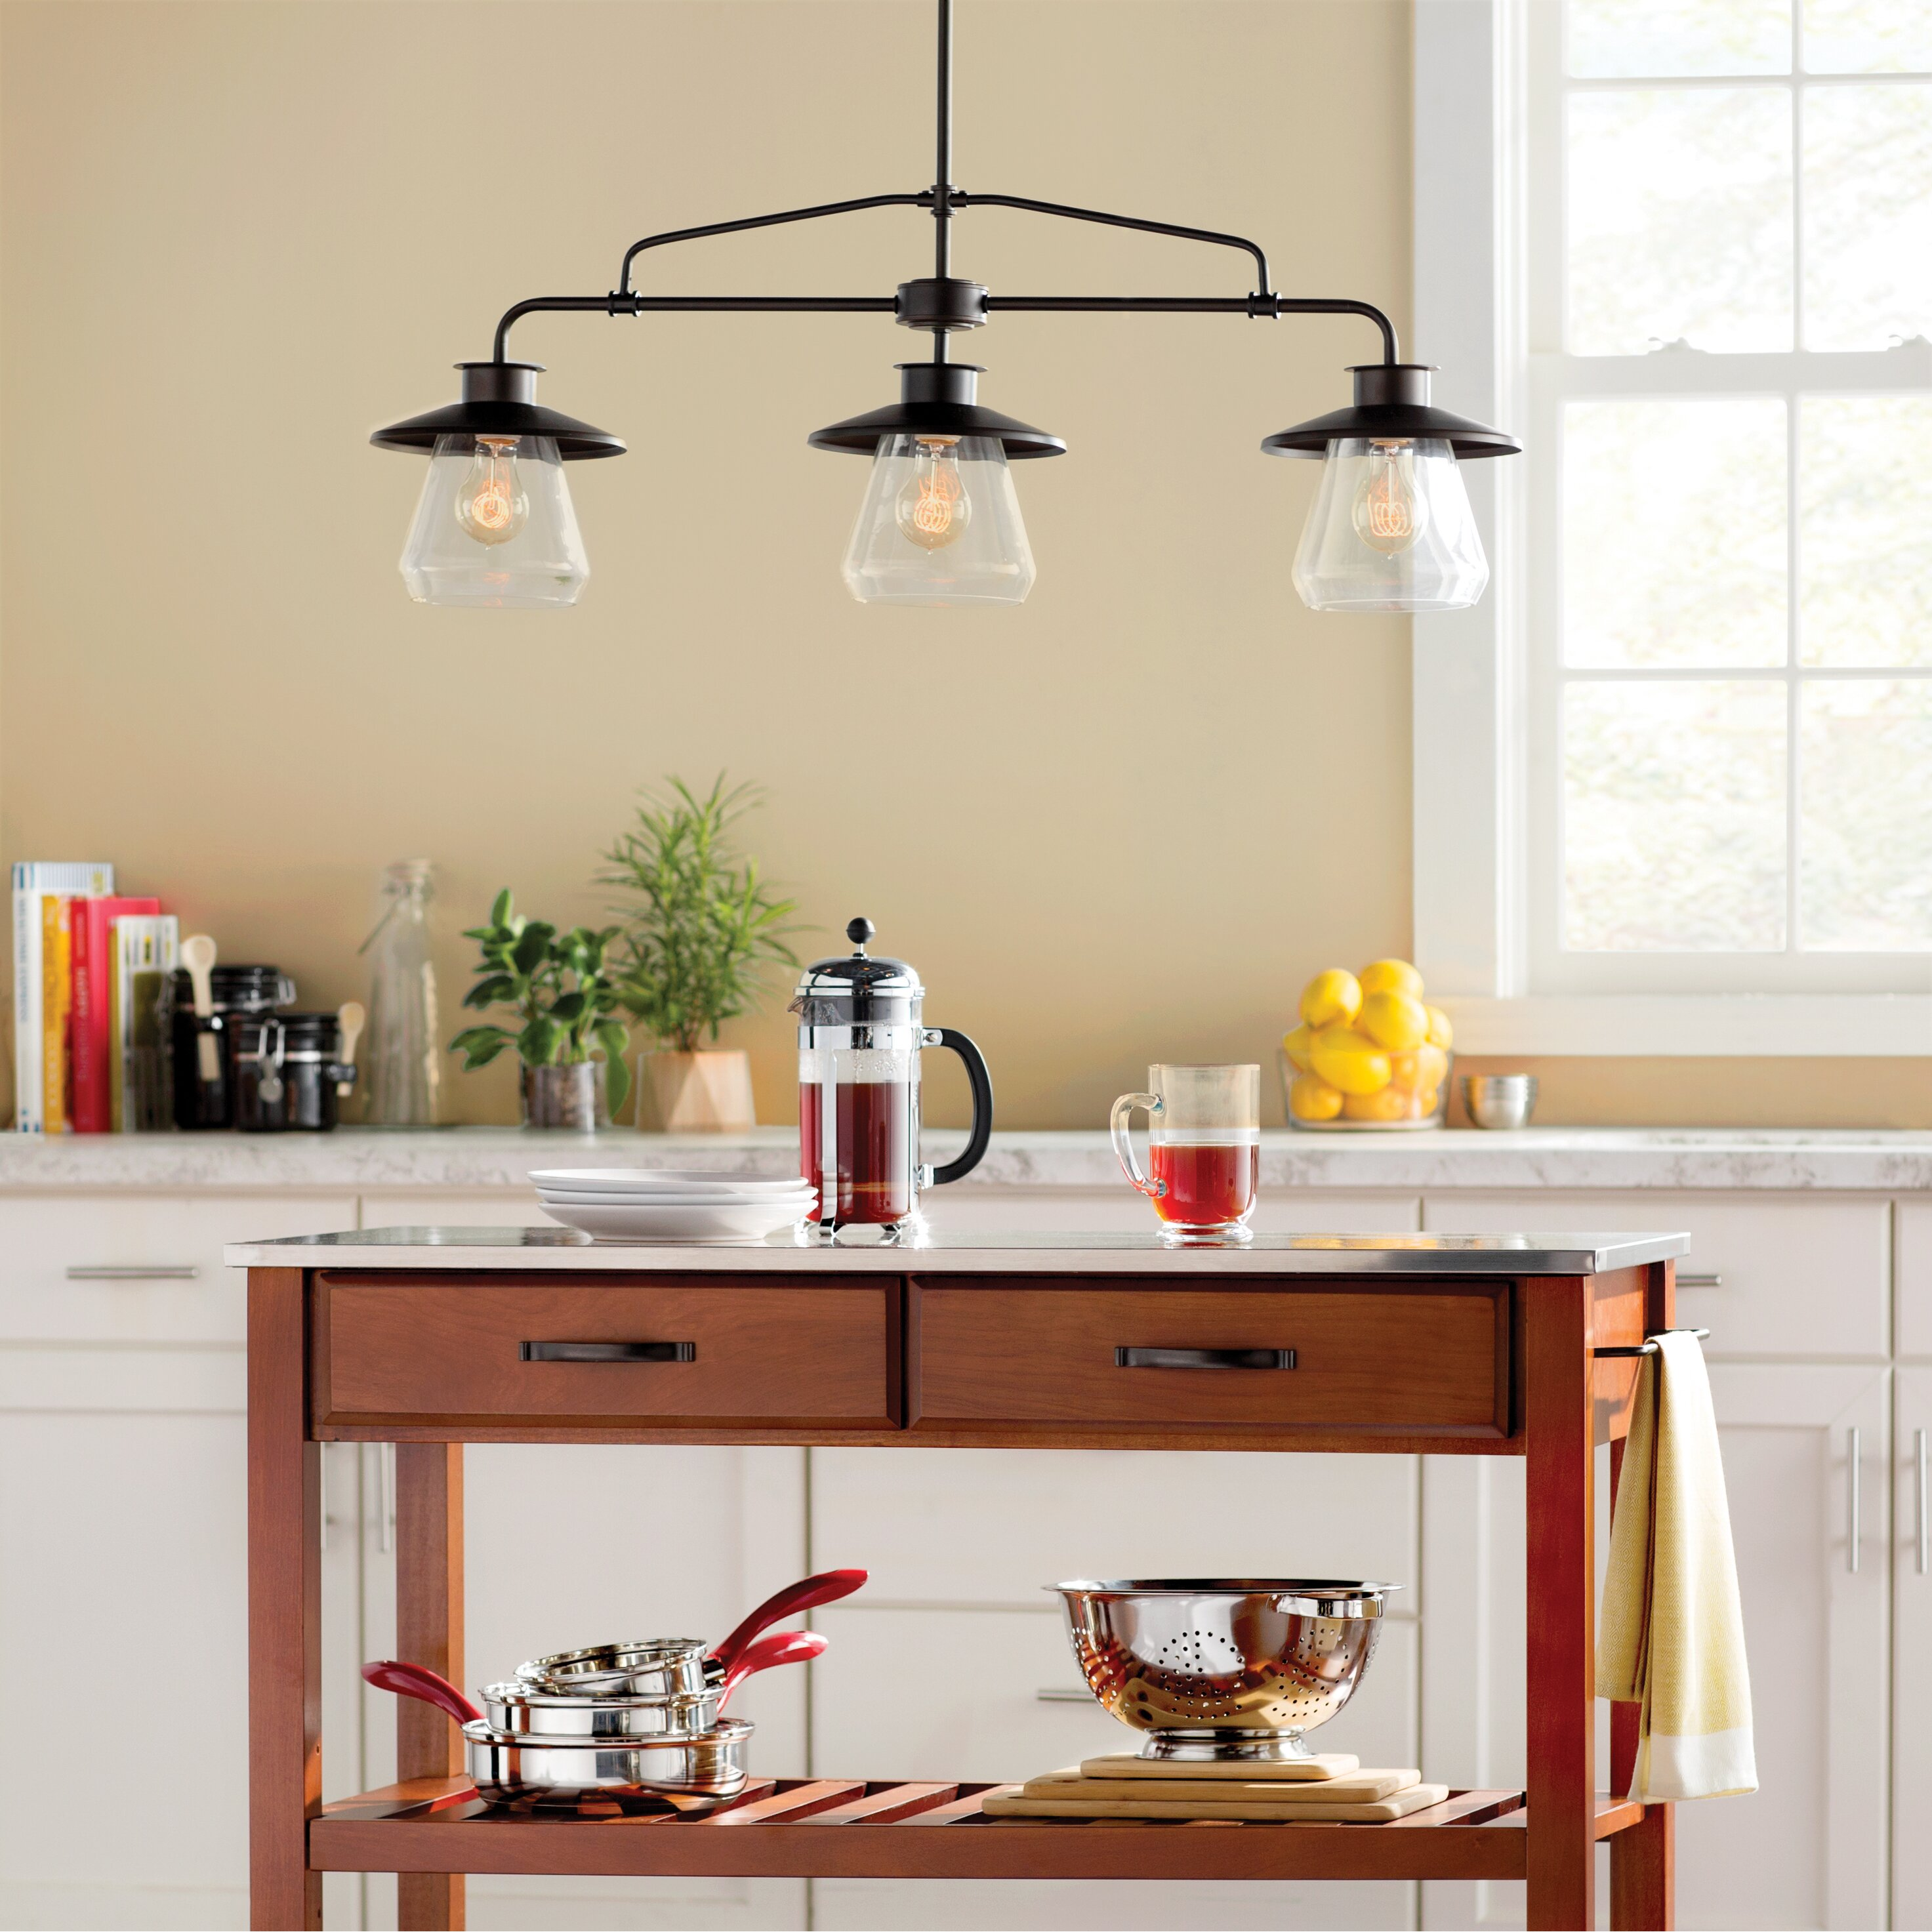 Kitchen Light: Brouillard 3-Light Kitchen Island Pendant & Reviews